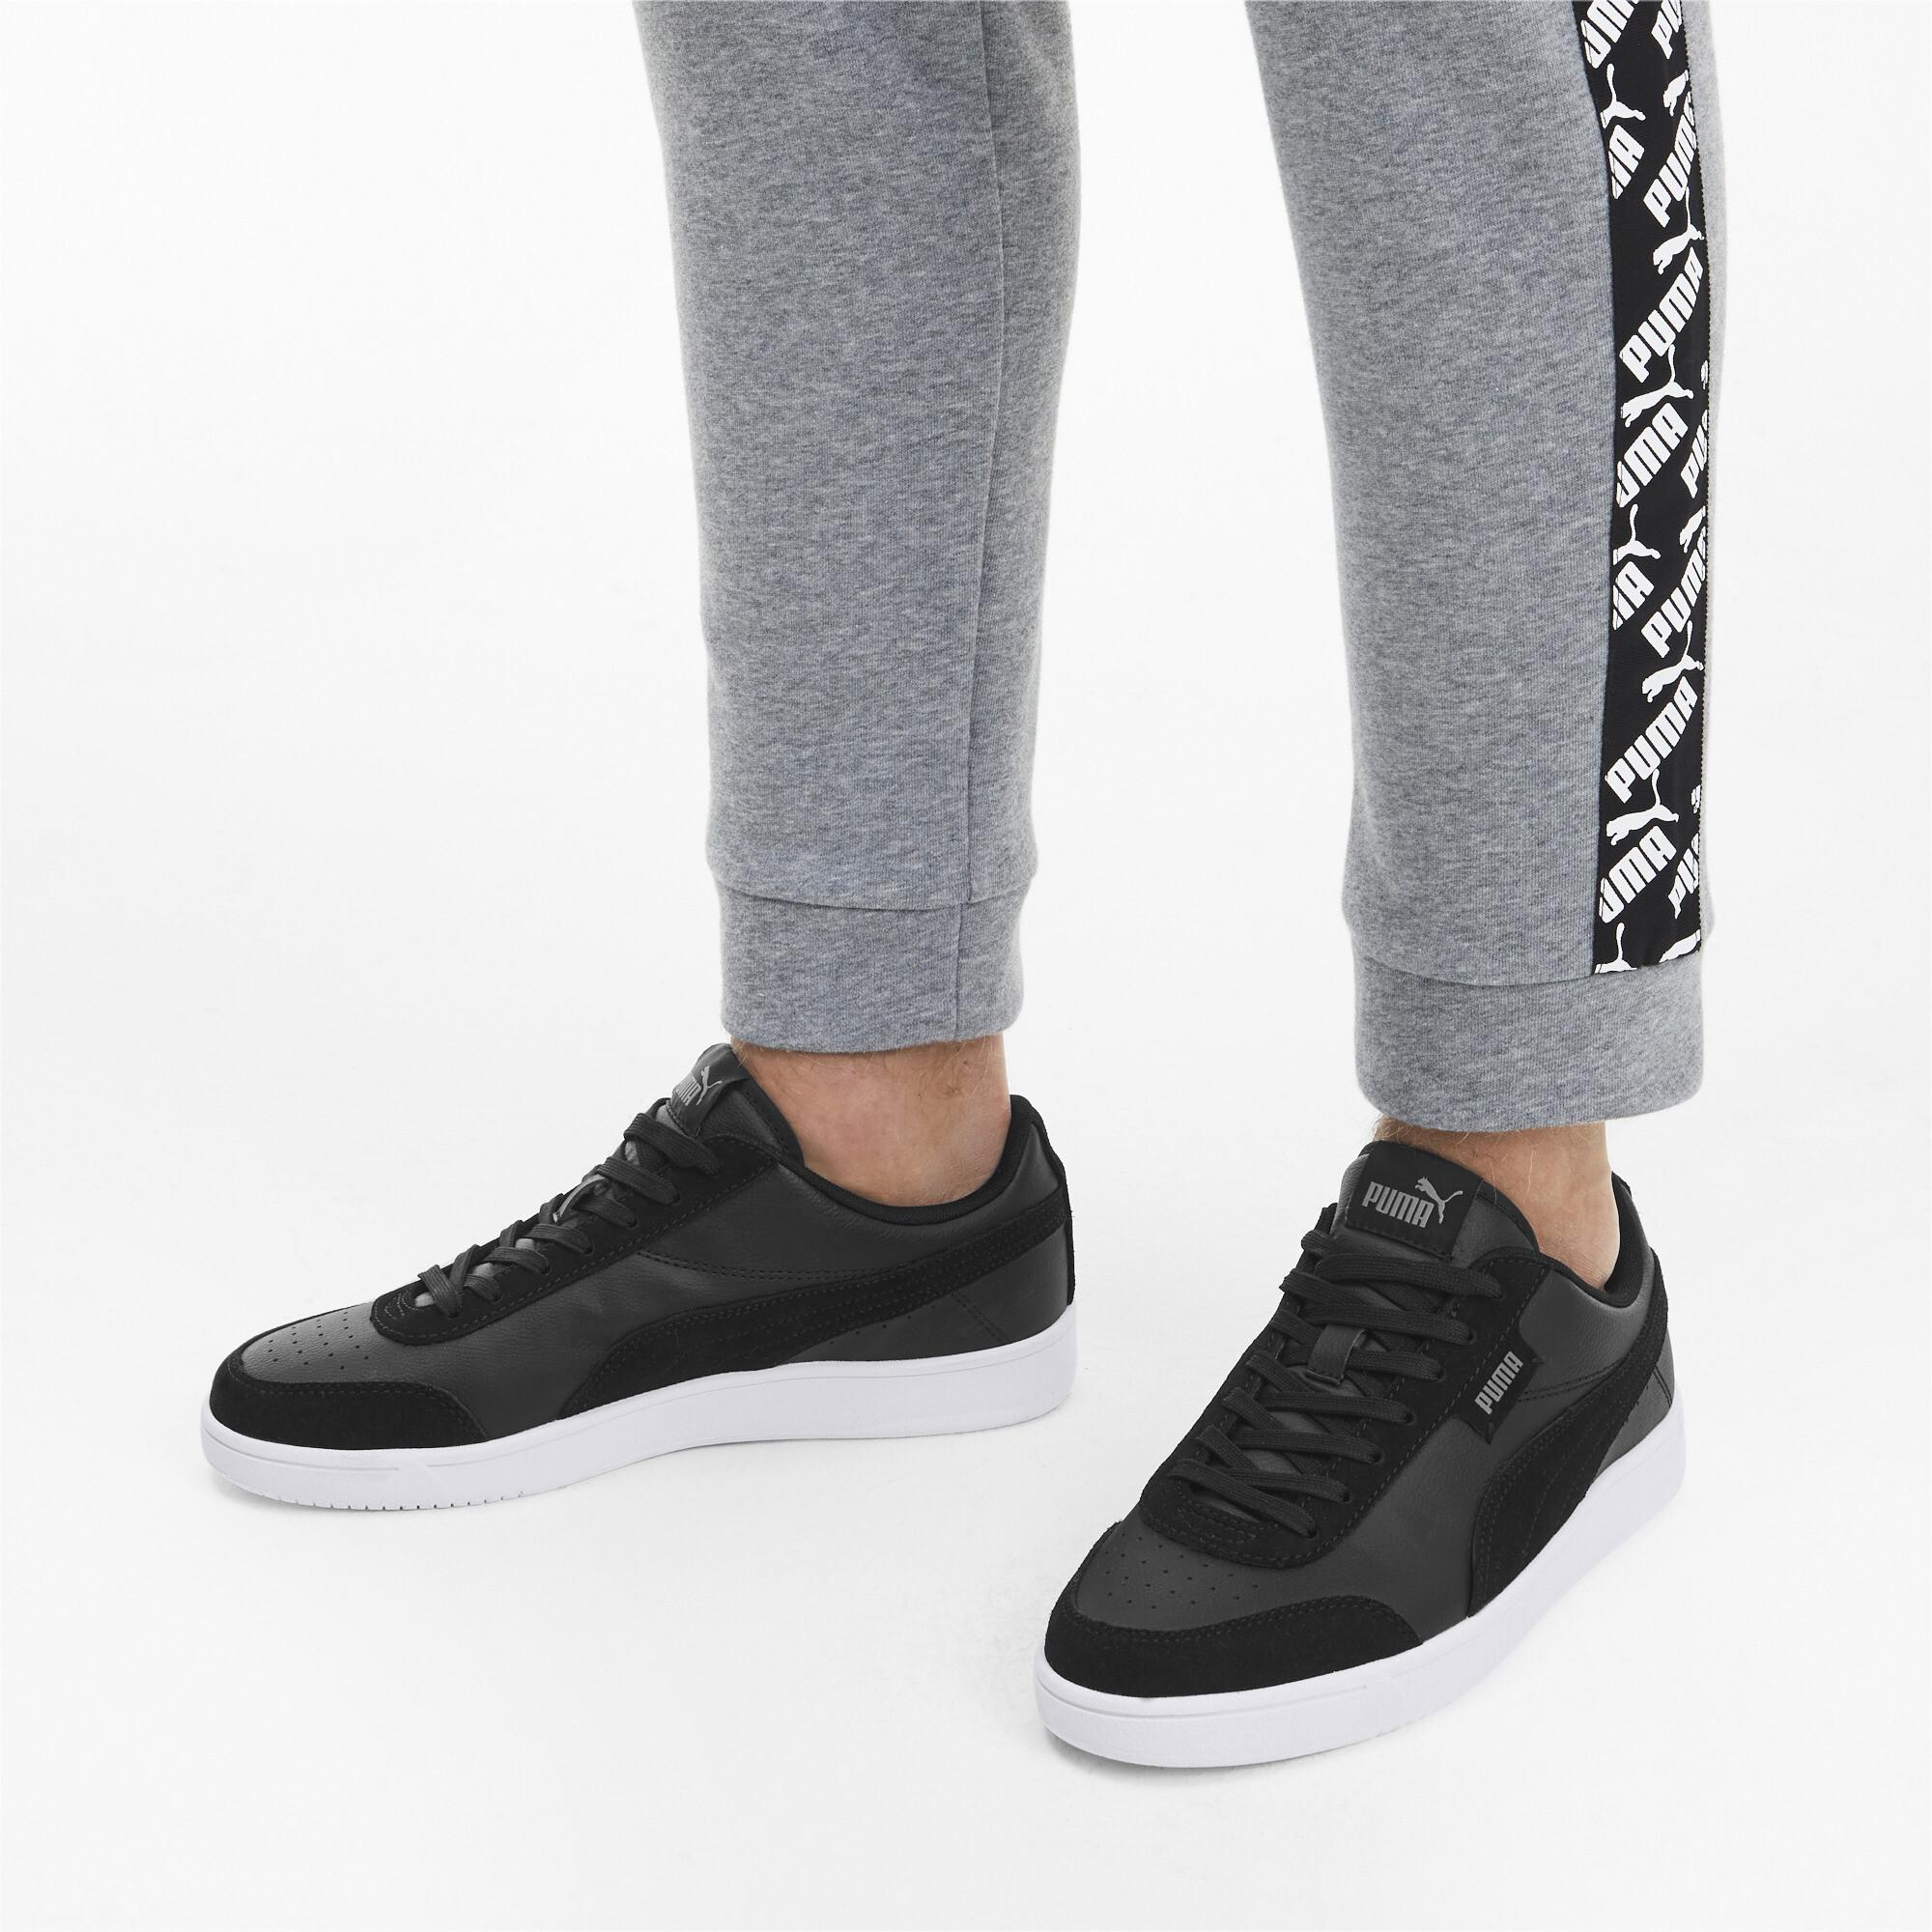 Indexbild 24 - PUMA Court Legend Lo Sneaker Unisex Schuhe Basics Neu